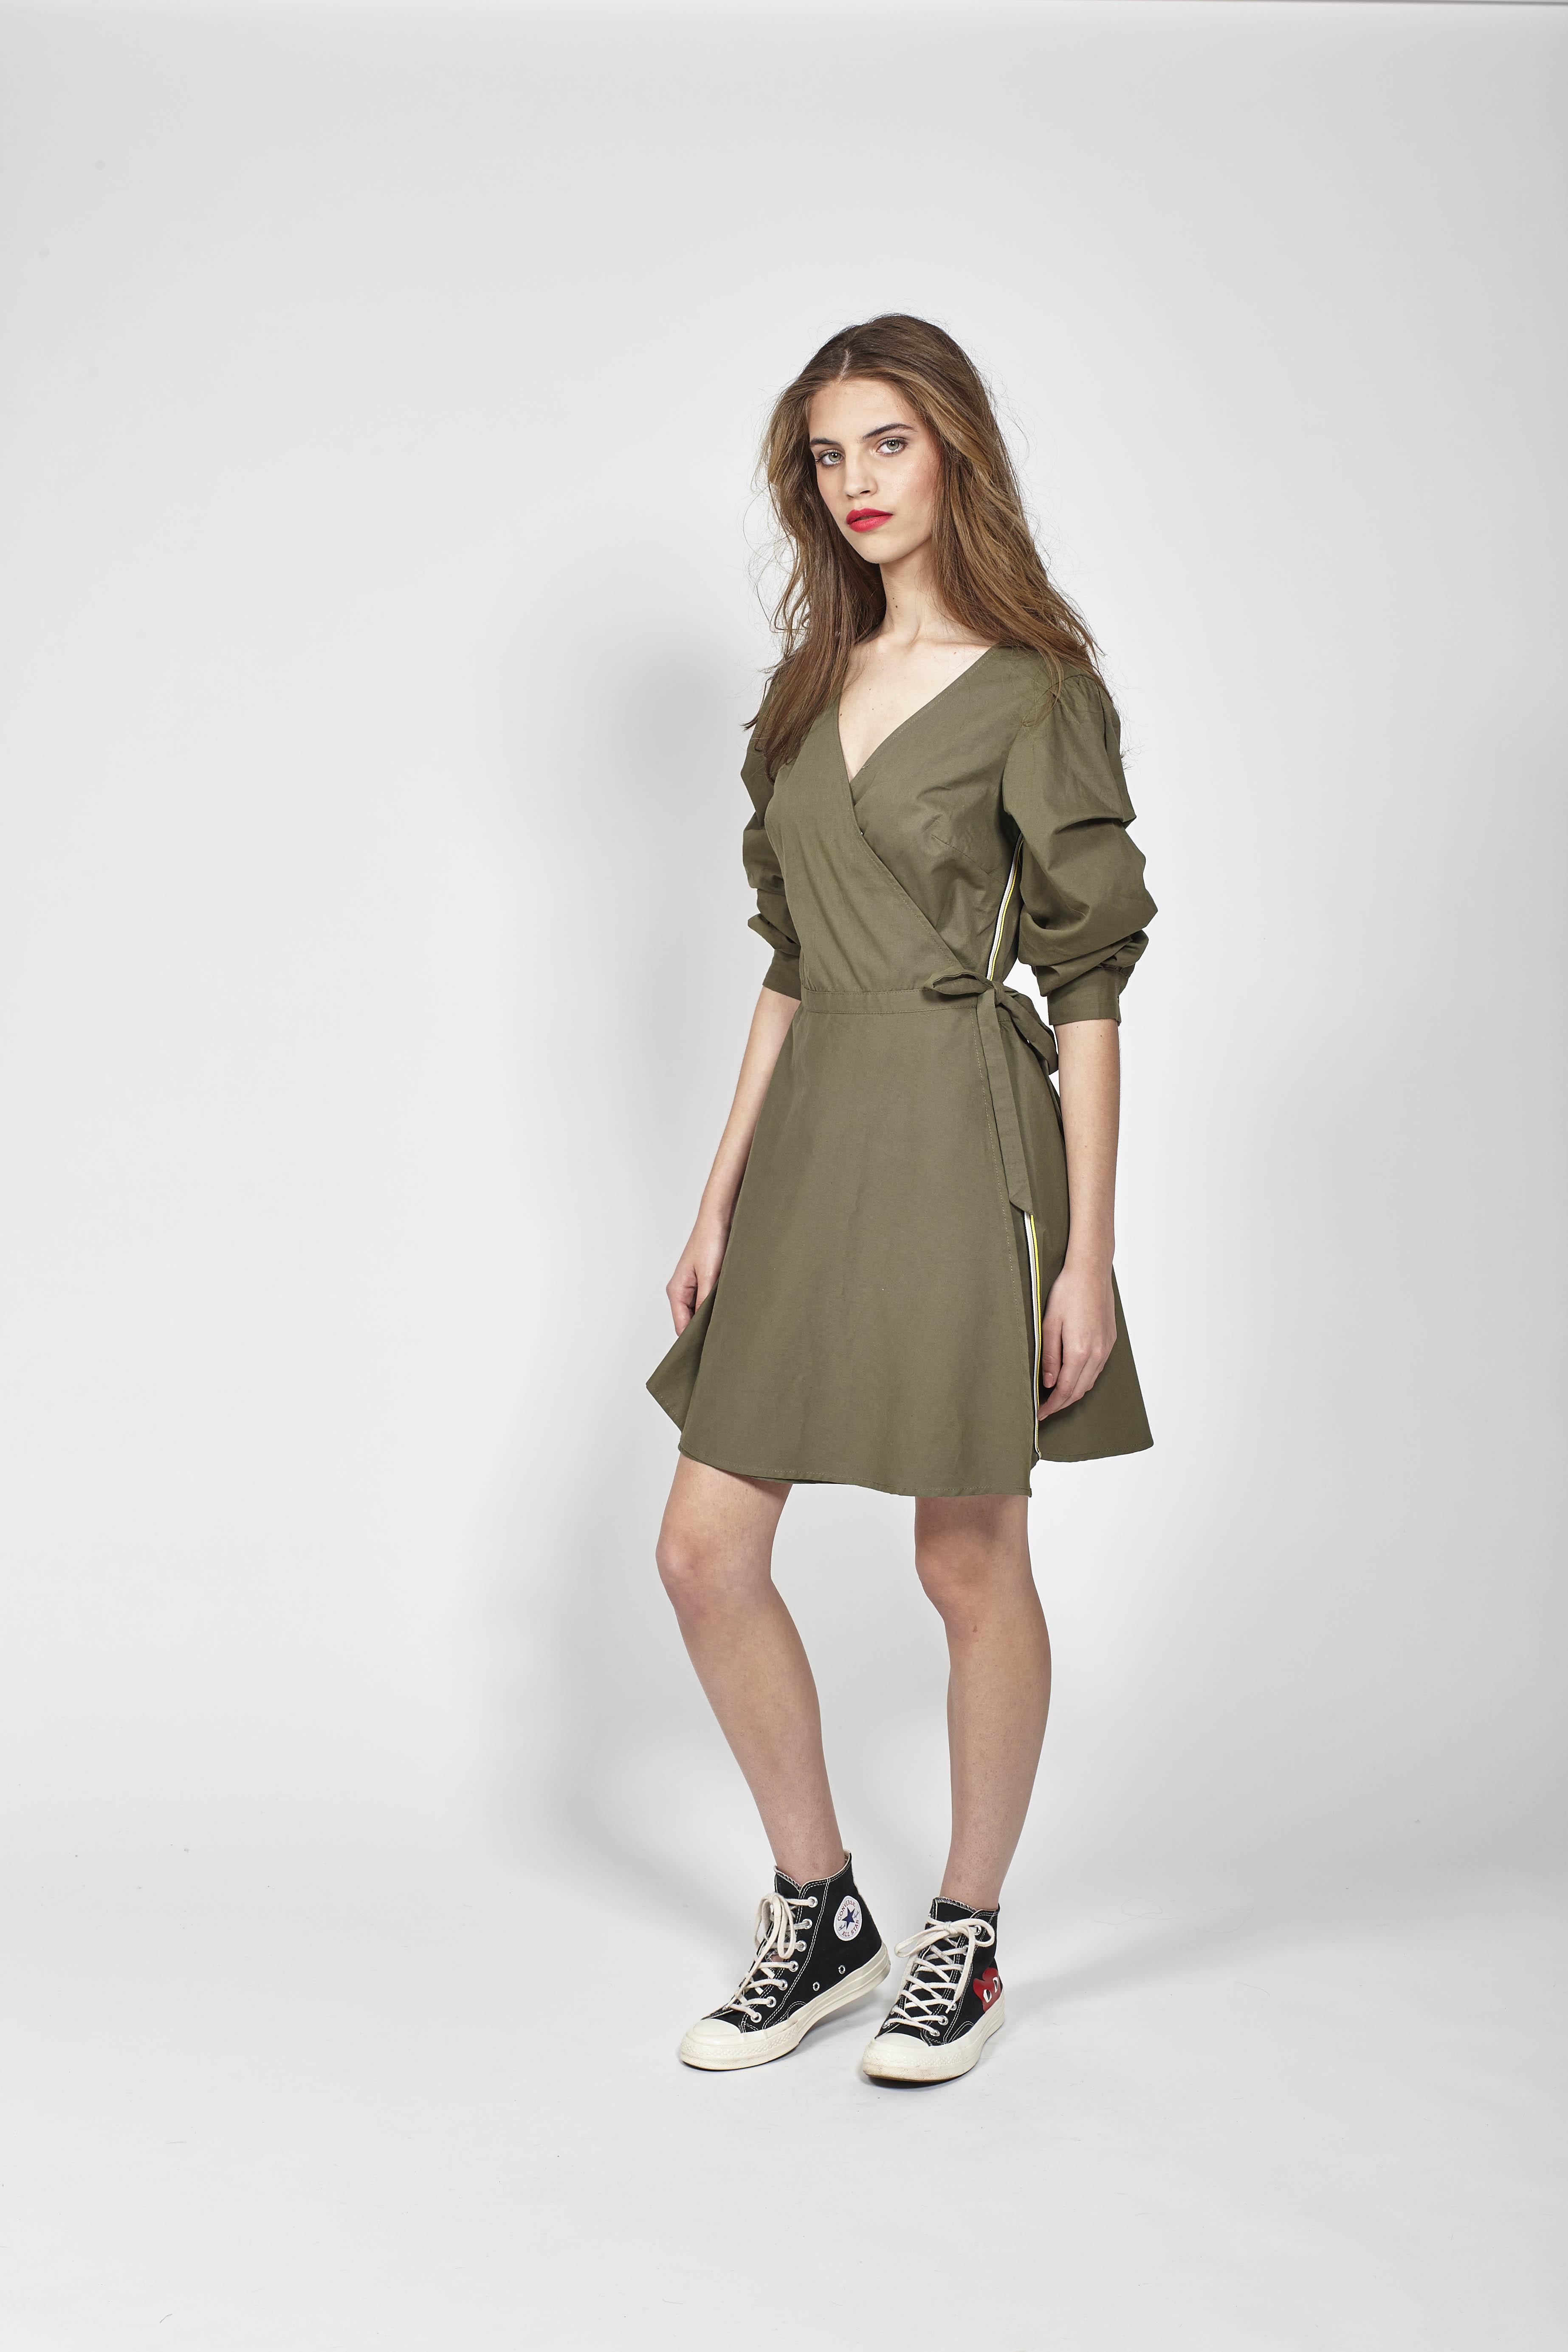 LB1085 LEO+BE Spirit Dress, RRP$188.00